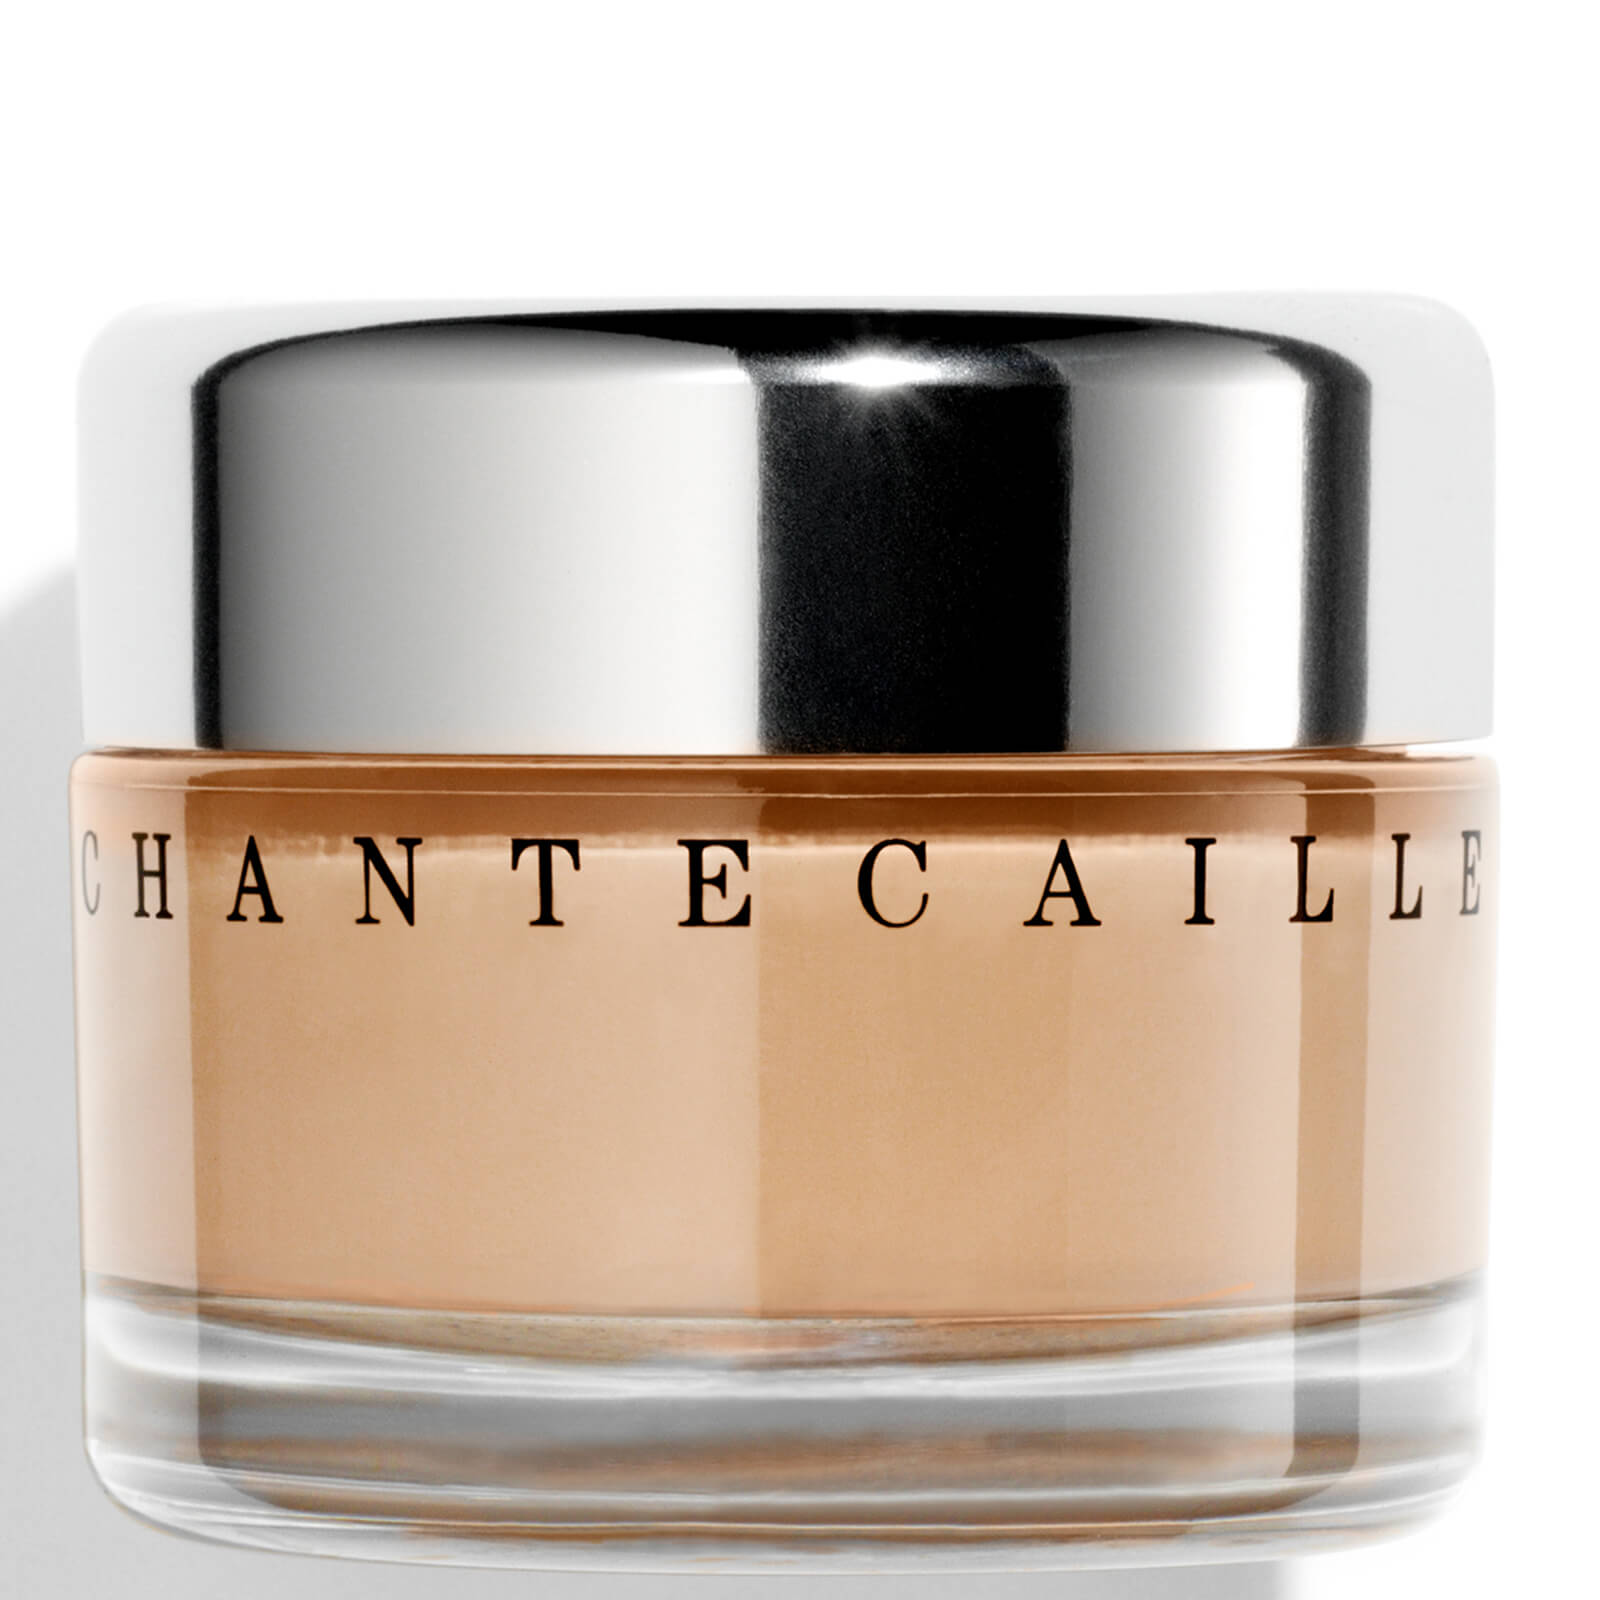 Chantecaille Future Skin Oil-Free Foundation 152 лв.